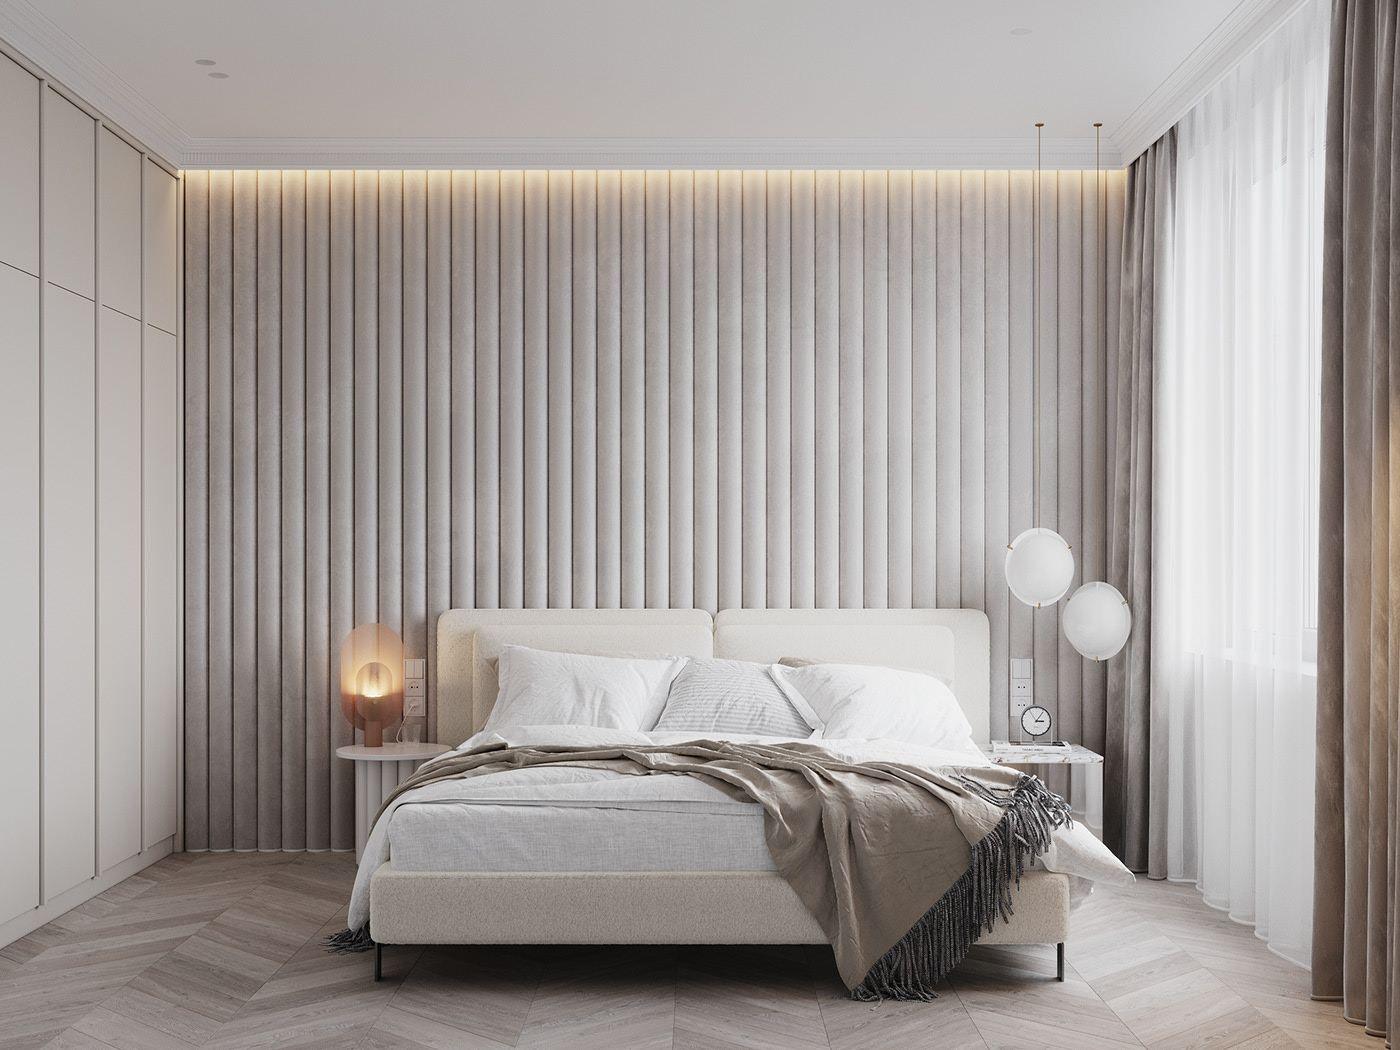 ACCENTS SPB AZ on Behance   Bedroom interior, Home room design ...